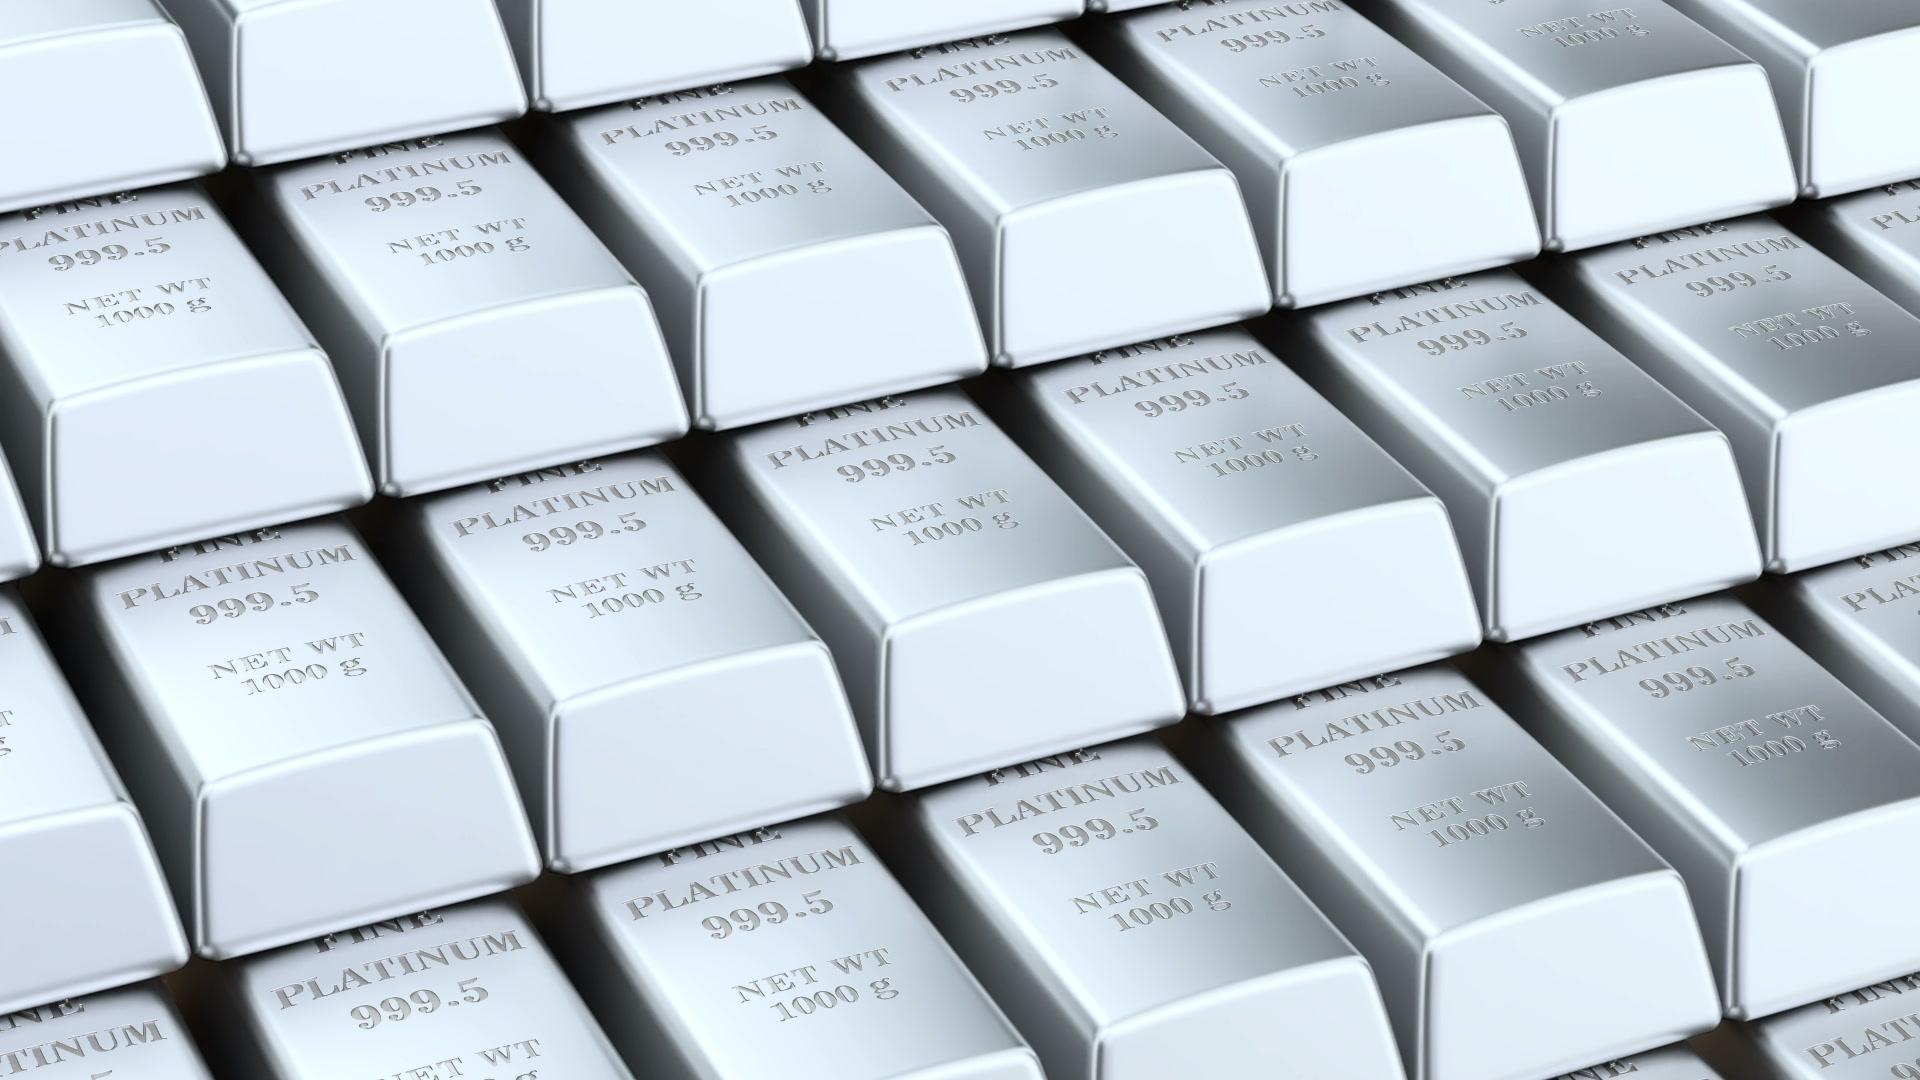 Platinum Wave Analysis – 27 February, 2019